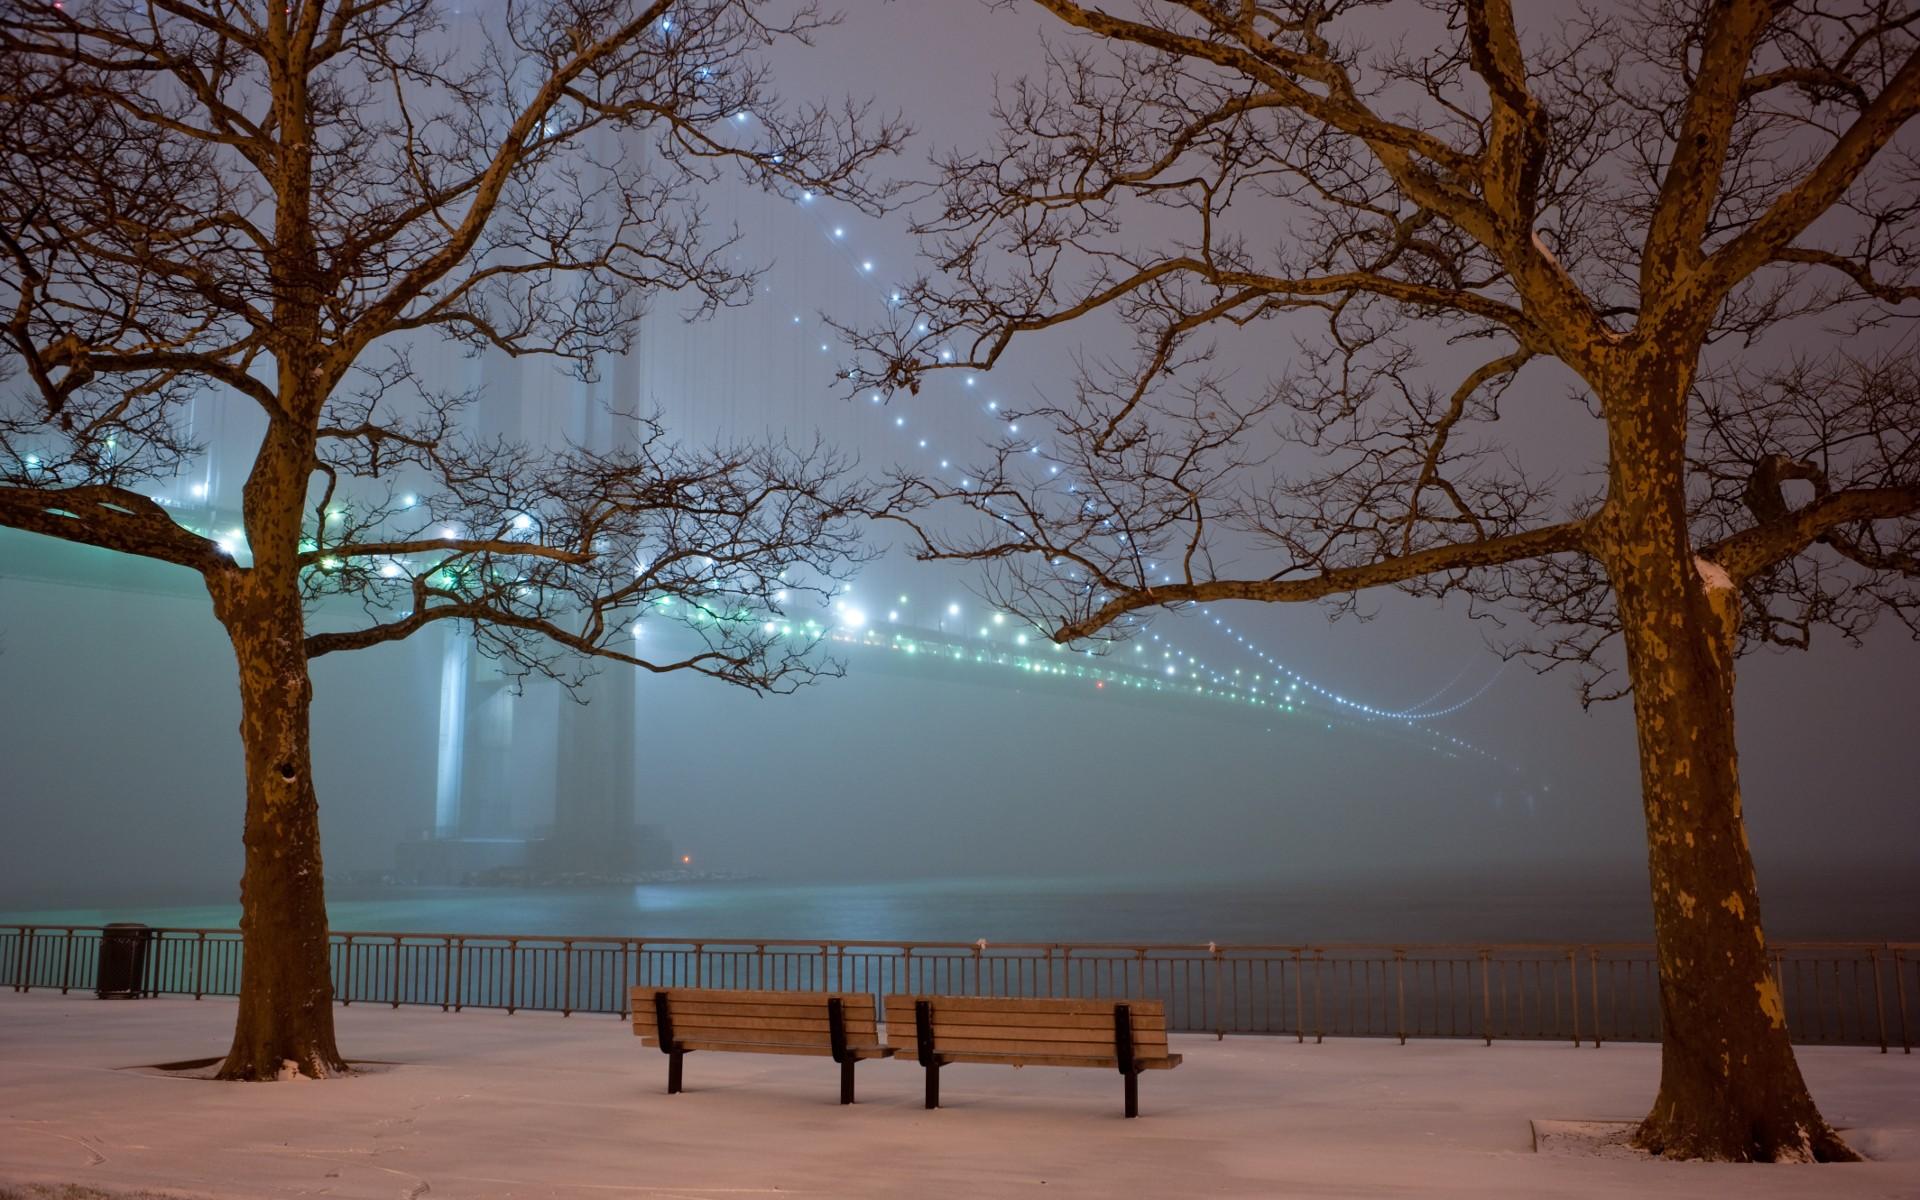 Romantic Winter Night Hd Wallpapers Desktop Picture